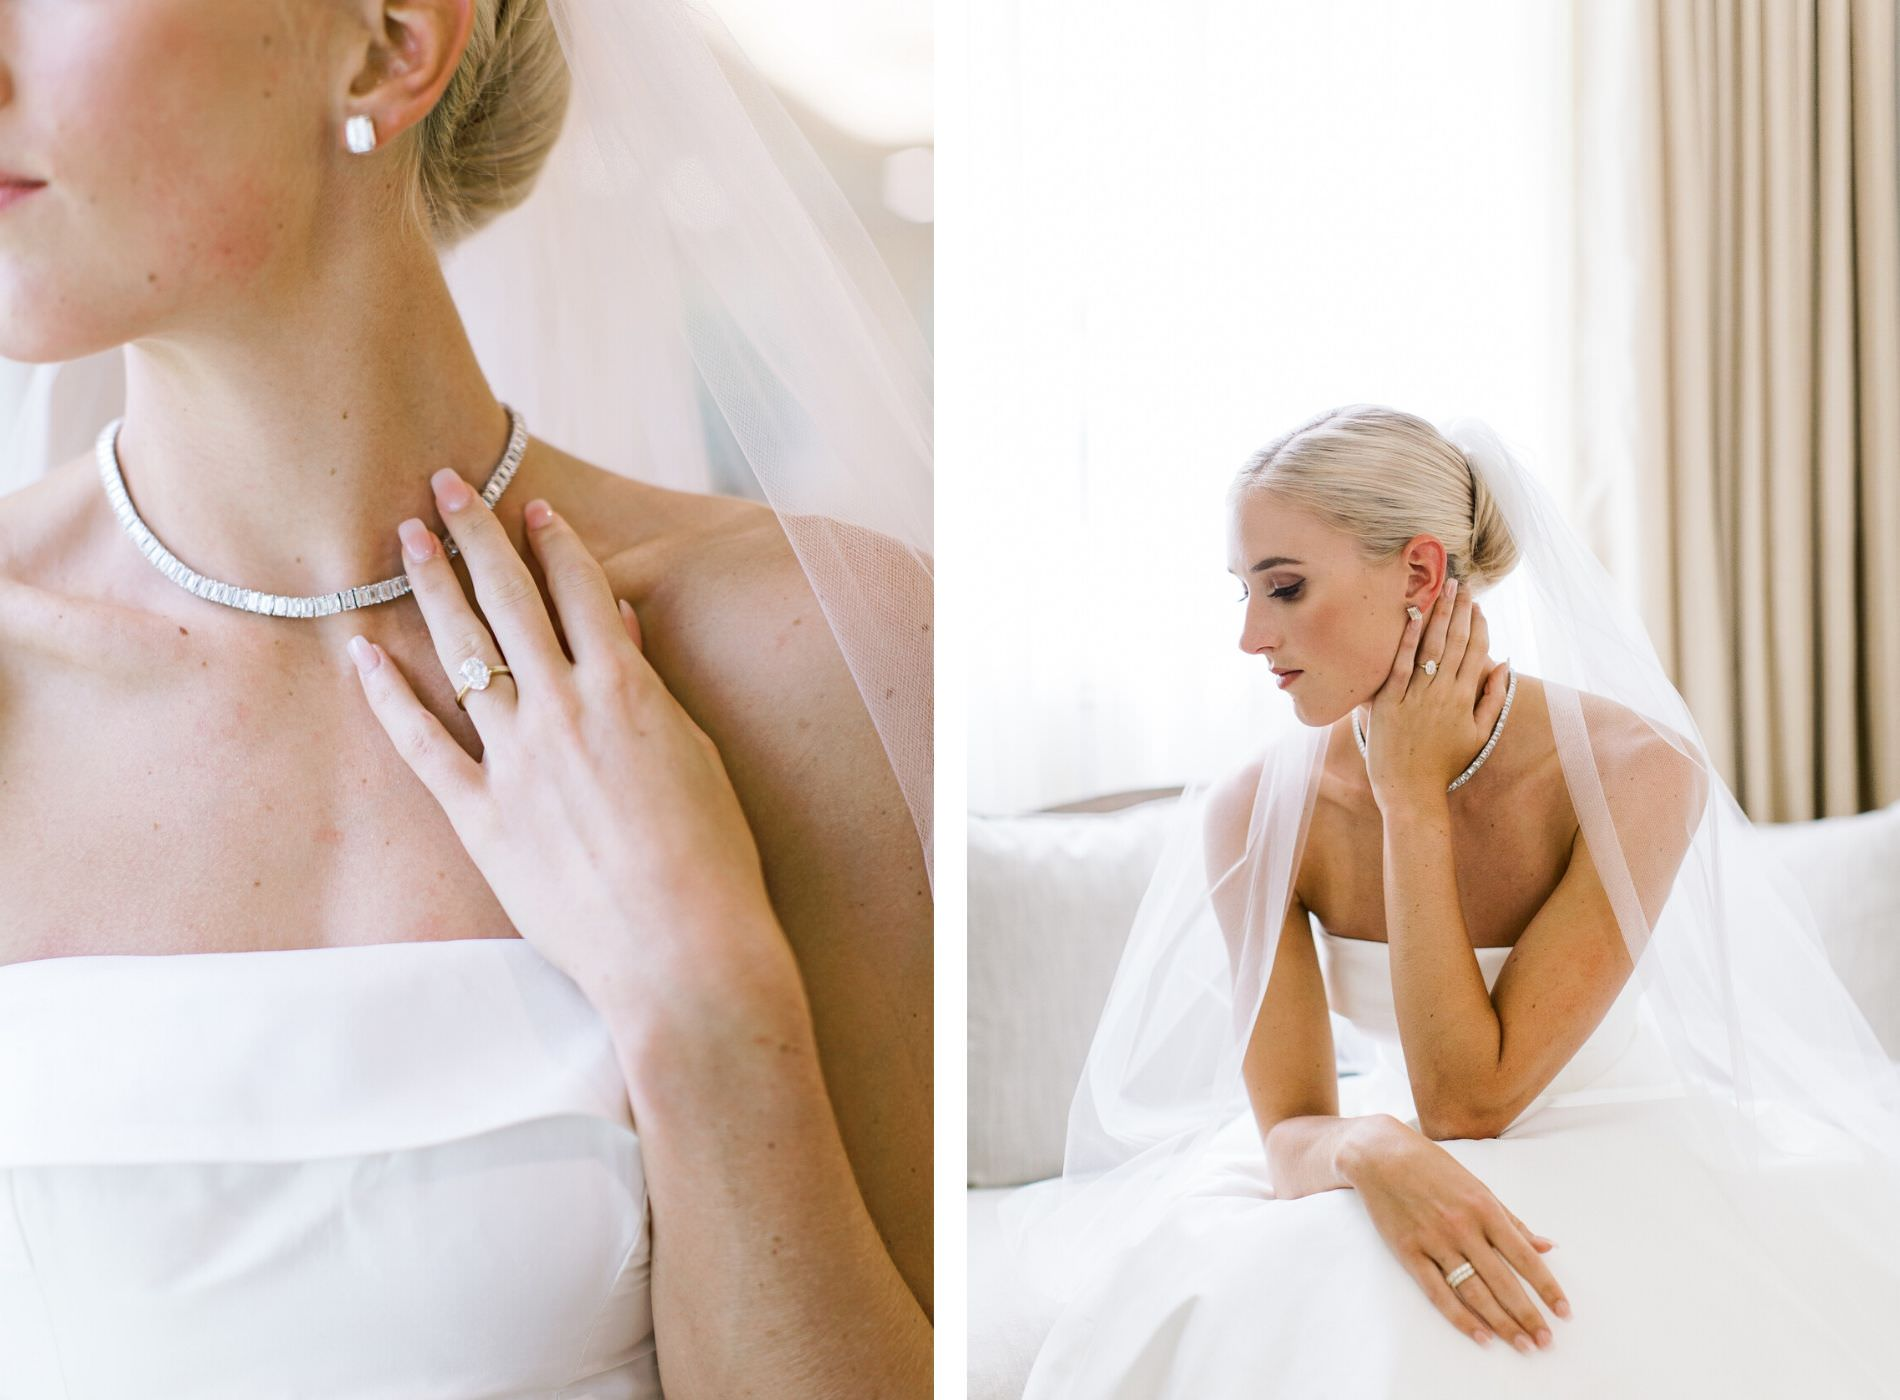 Classic Tampa Bride Getting Ready Wedding Portrait Wearing Diamond Choker Necklace